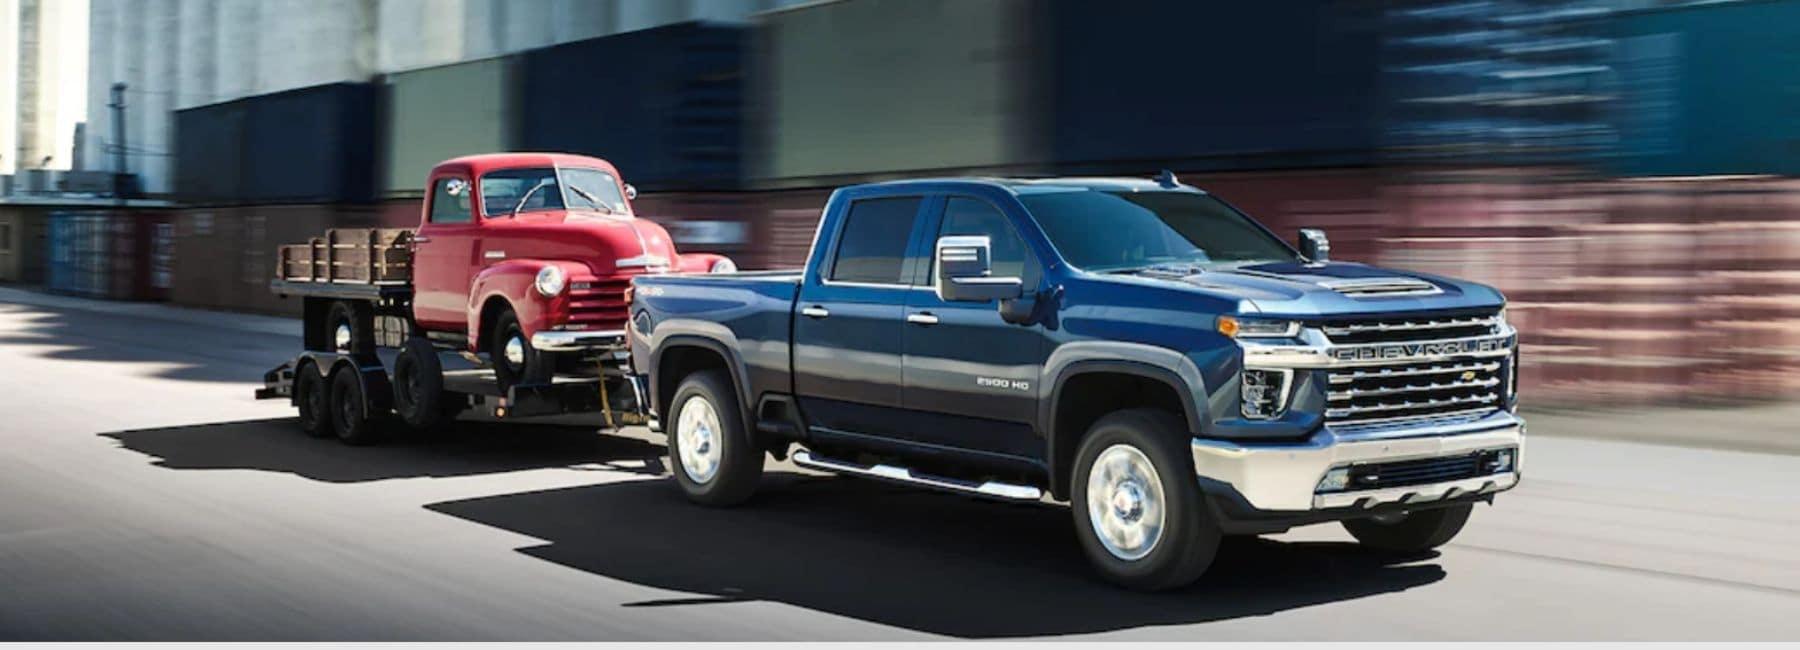 Blue 2021 Chevrolet Silverado 2500 Towing An Old Red Chevy Truck   Chevrolet Dealer Near Mescalero, NM